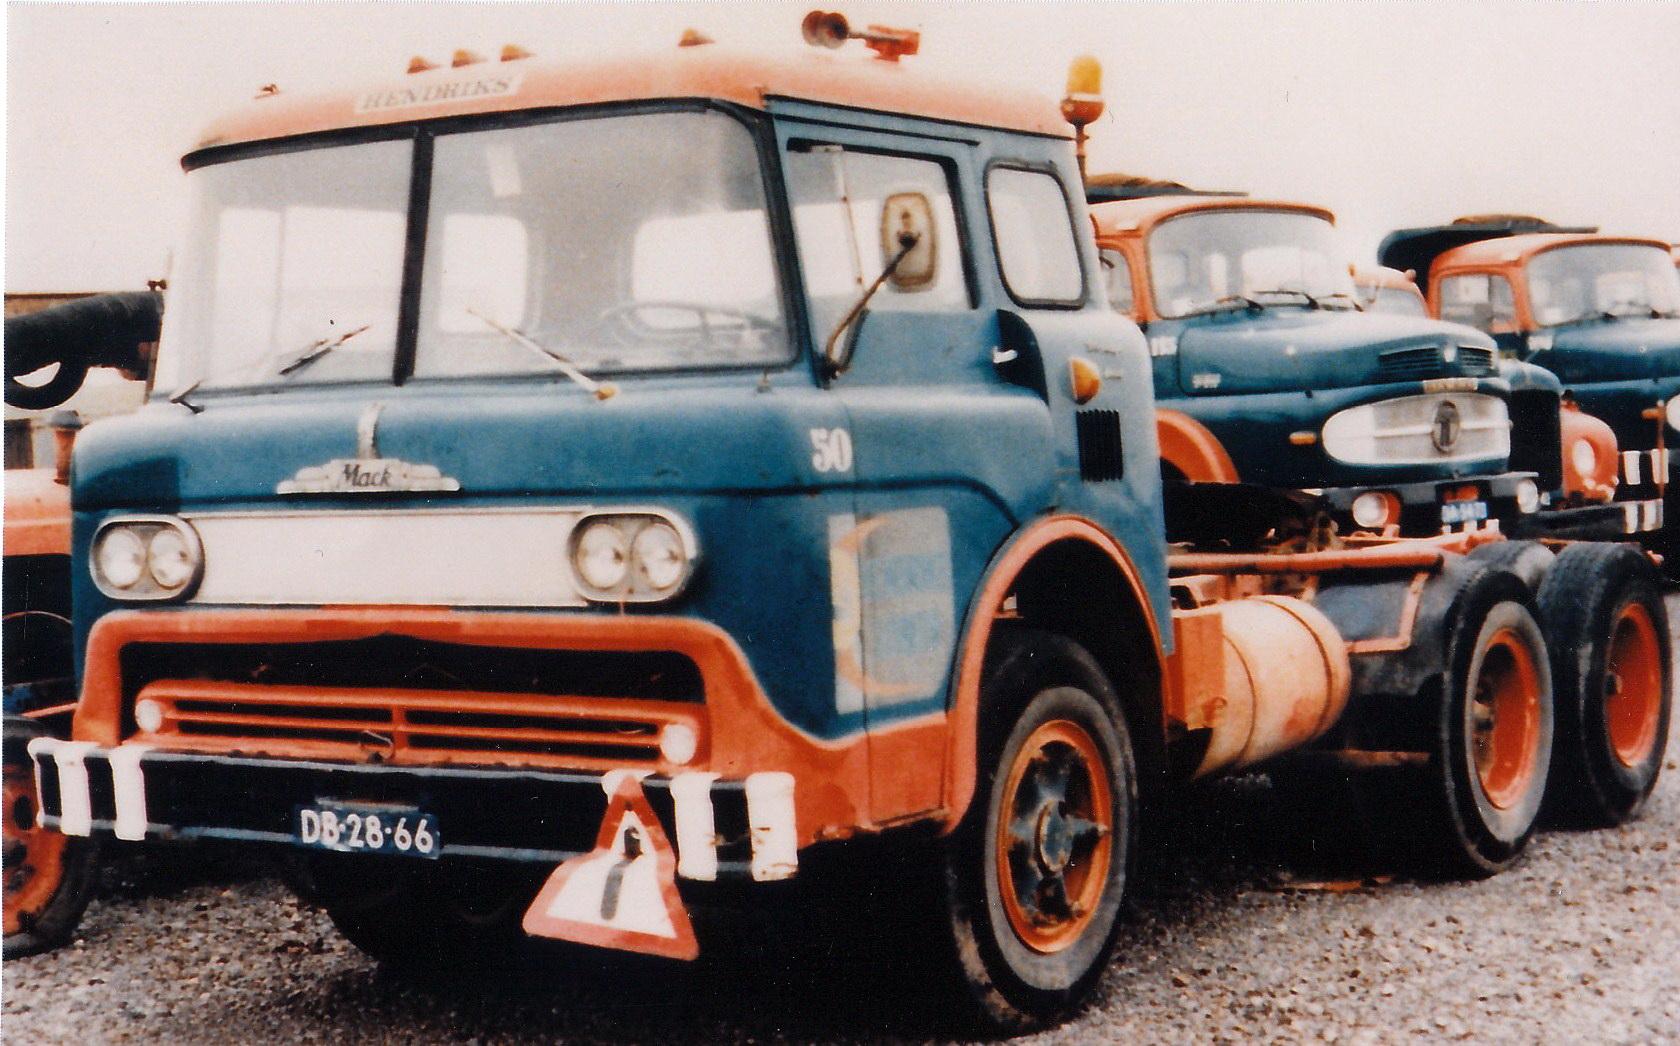 Hendriks-Lobith-Mack-N61-DB2866